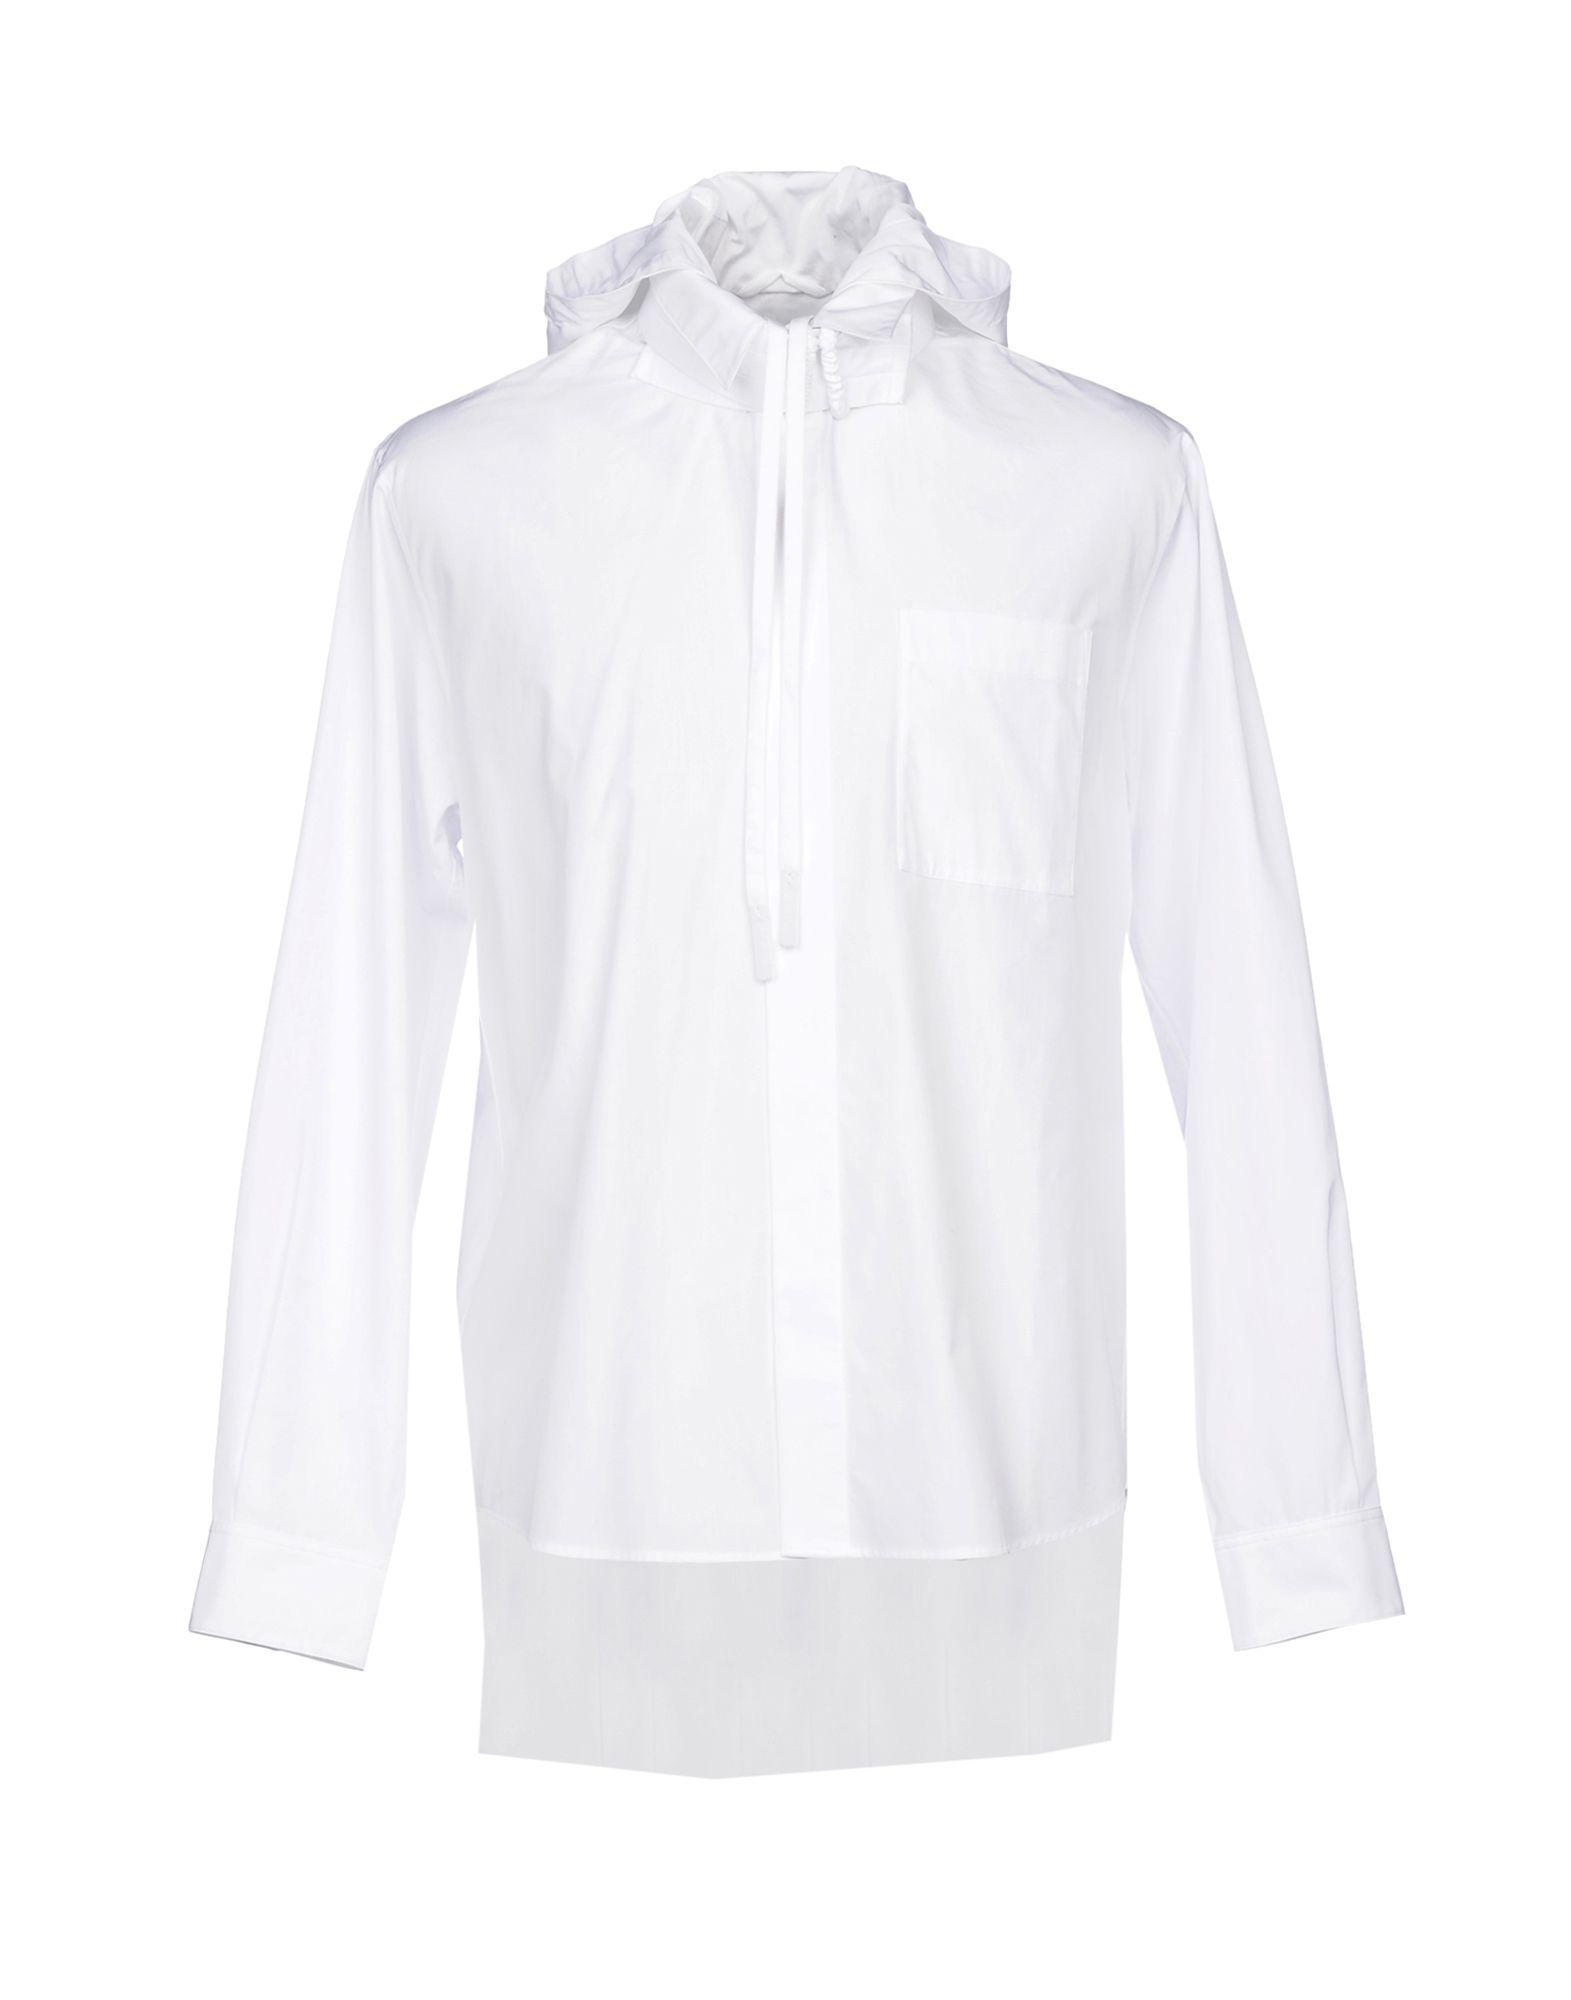 Craig Green Shirts In White